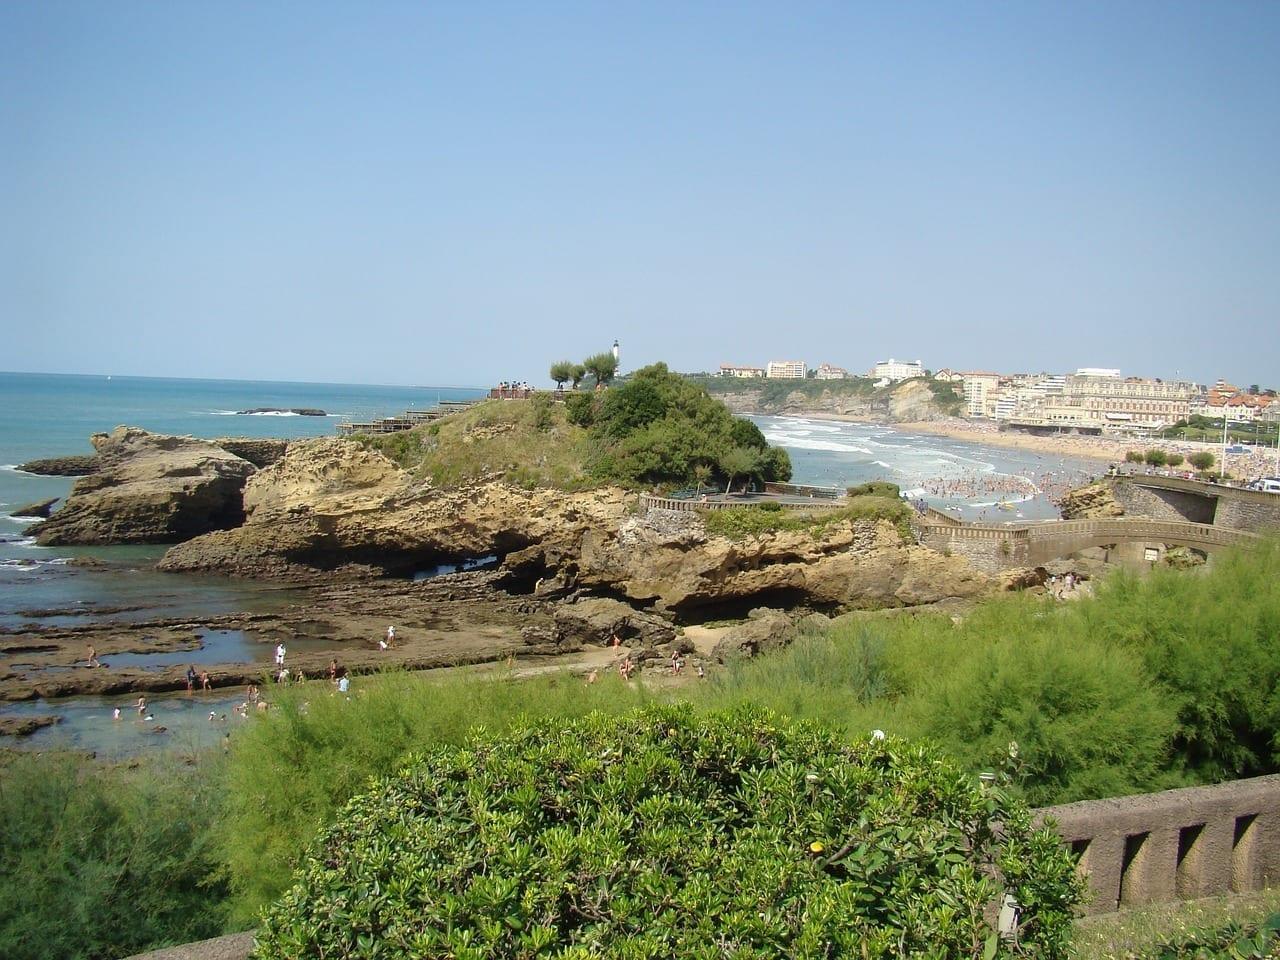 Vista Biarritz Verano Francia